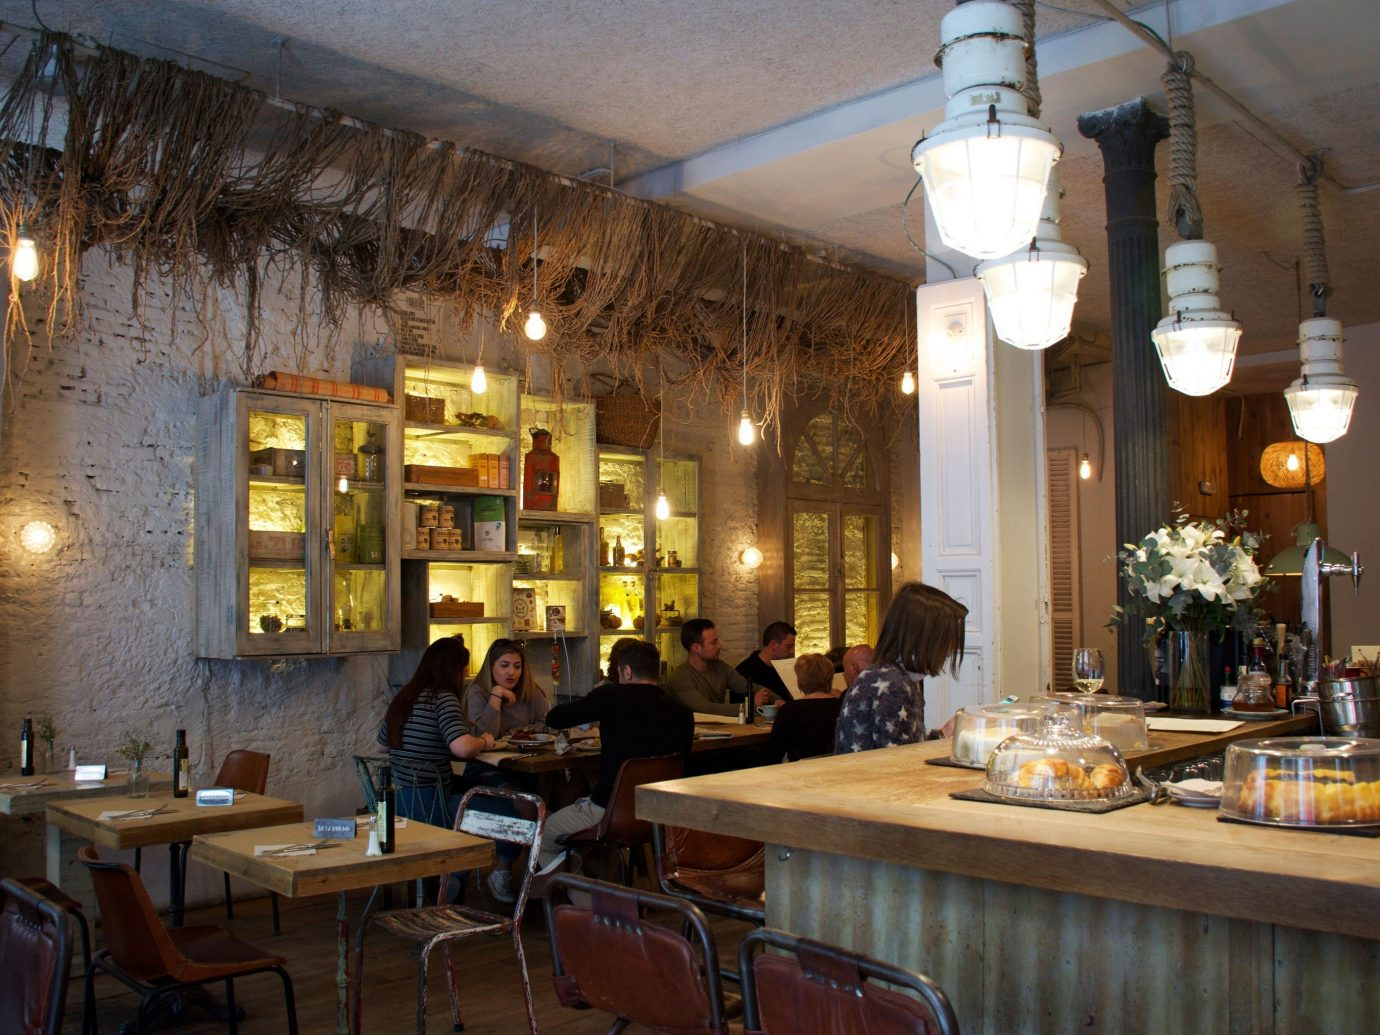 Trip Ideas table ceiling indoor property restaurant room estate interior design Bar tavern Dining area furniture